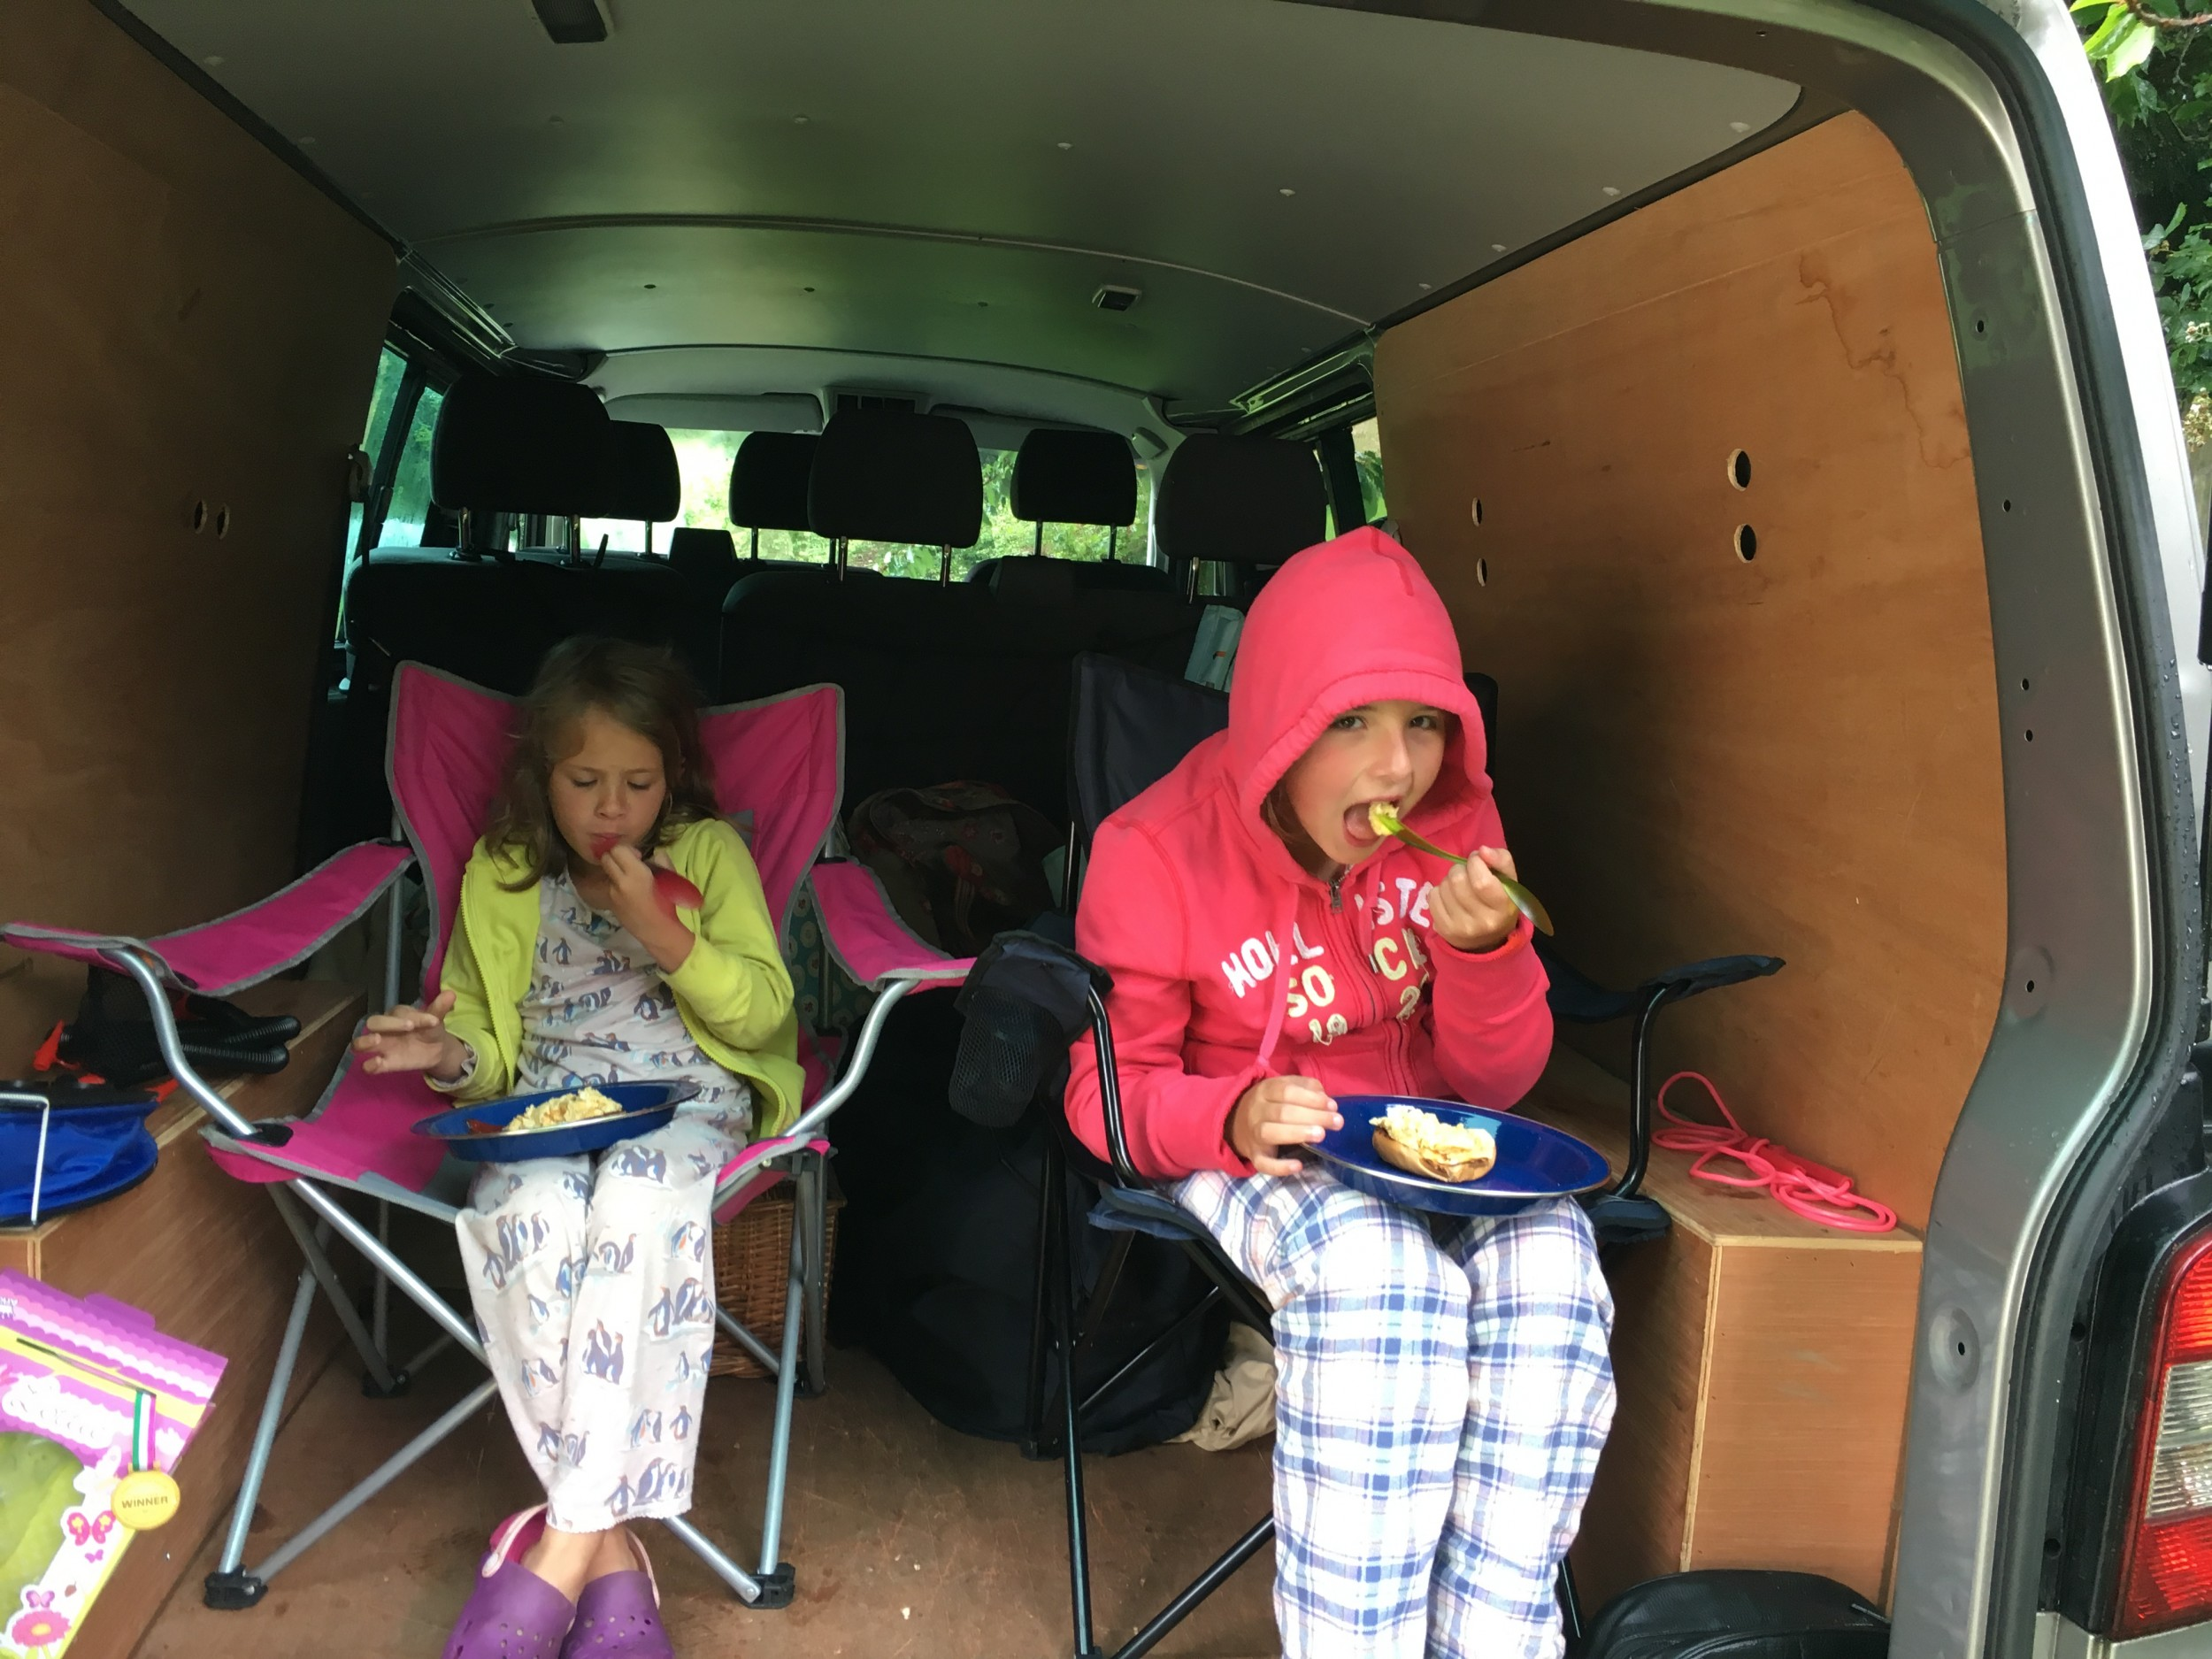 camping breakfast avoiding the rain